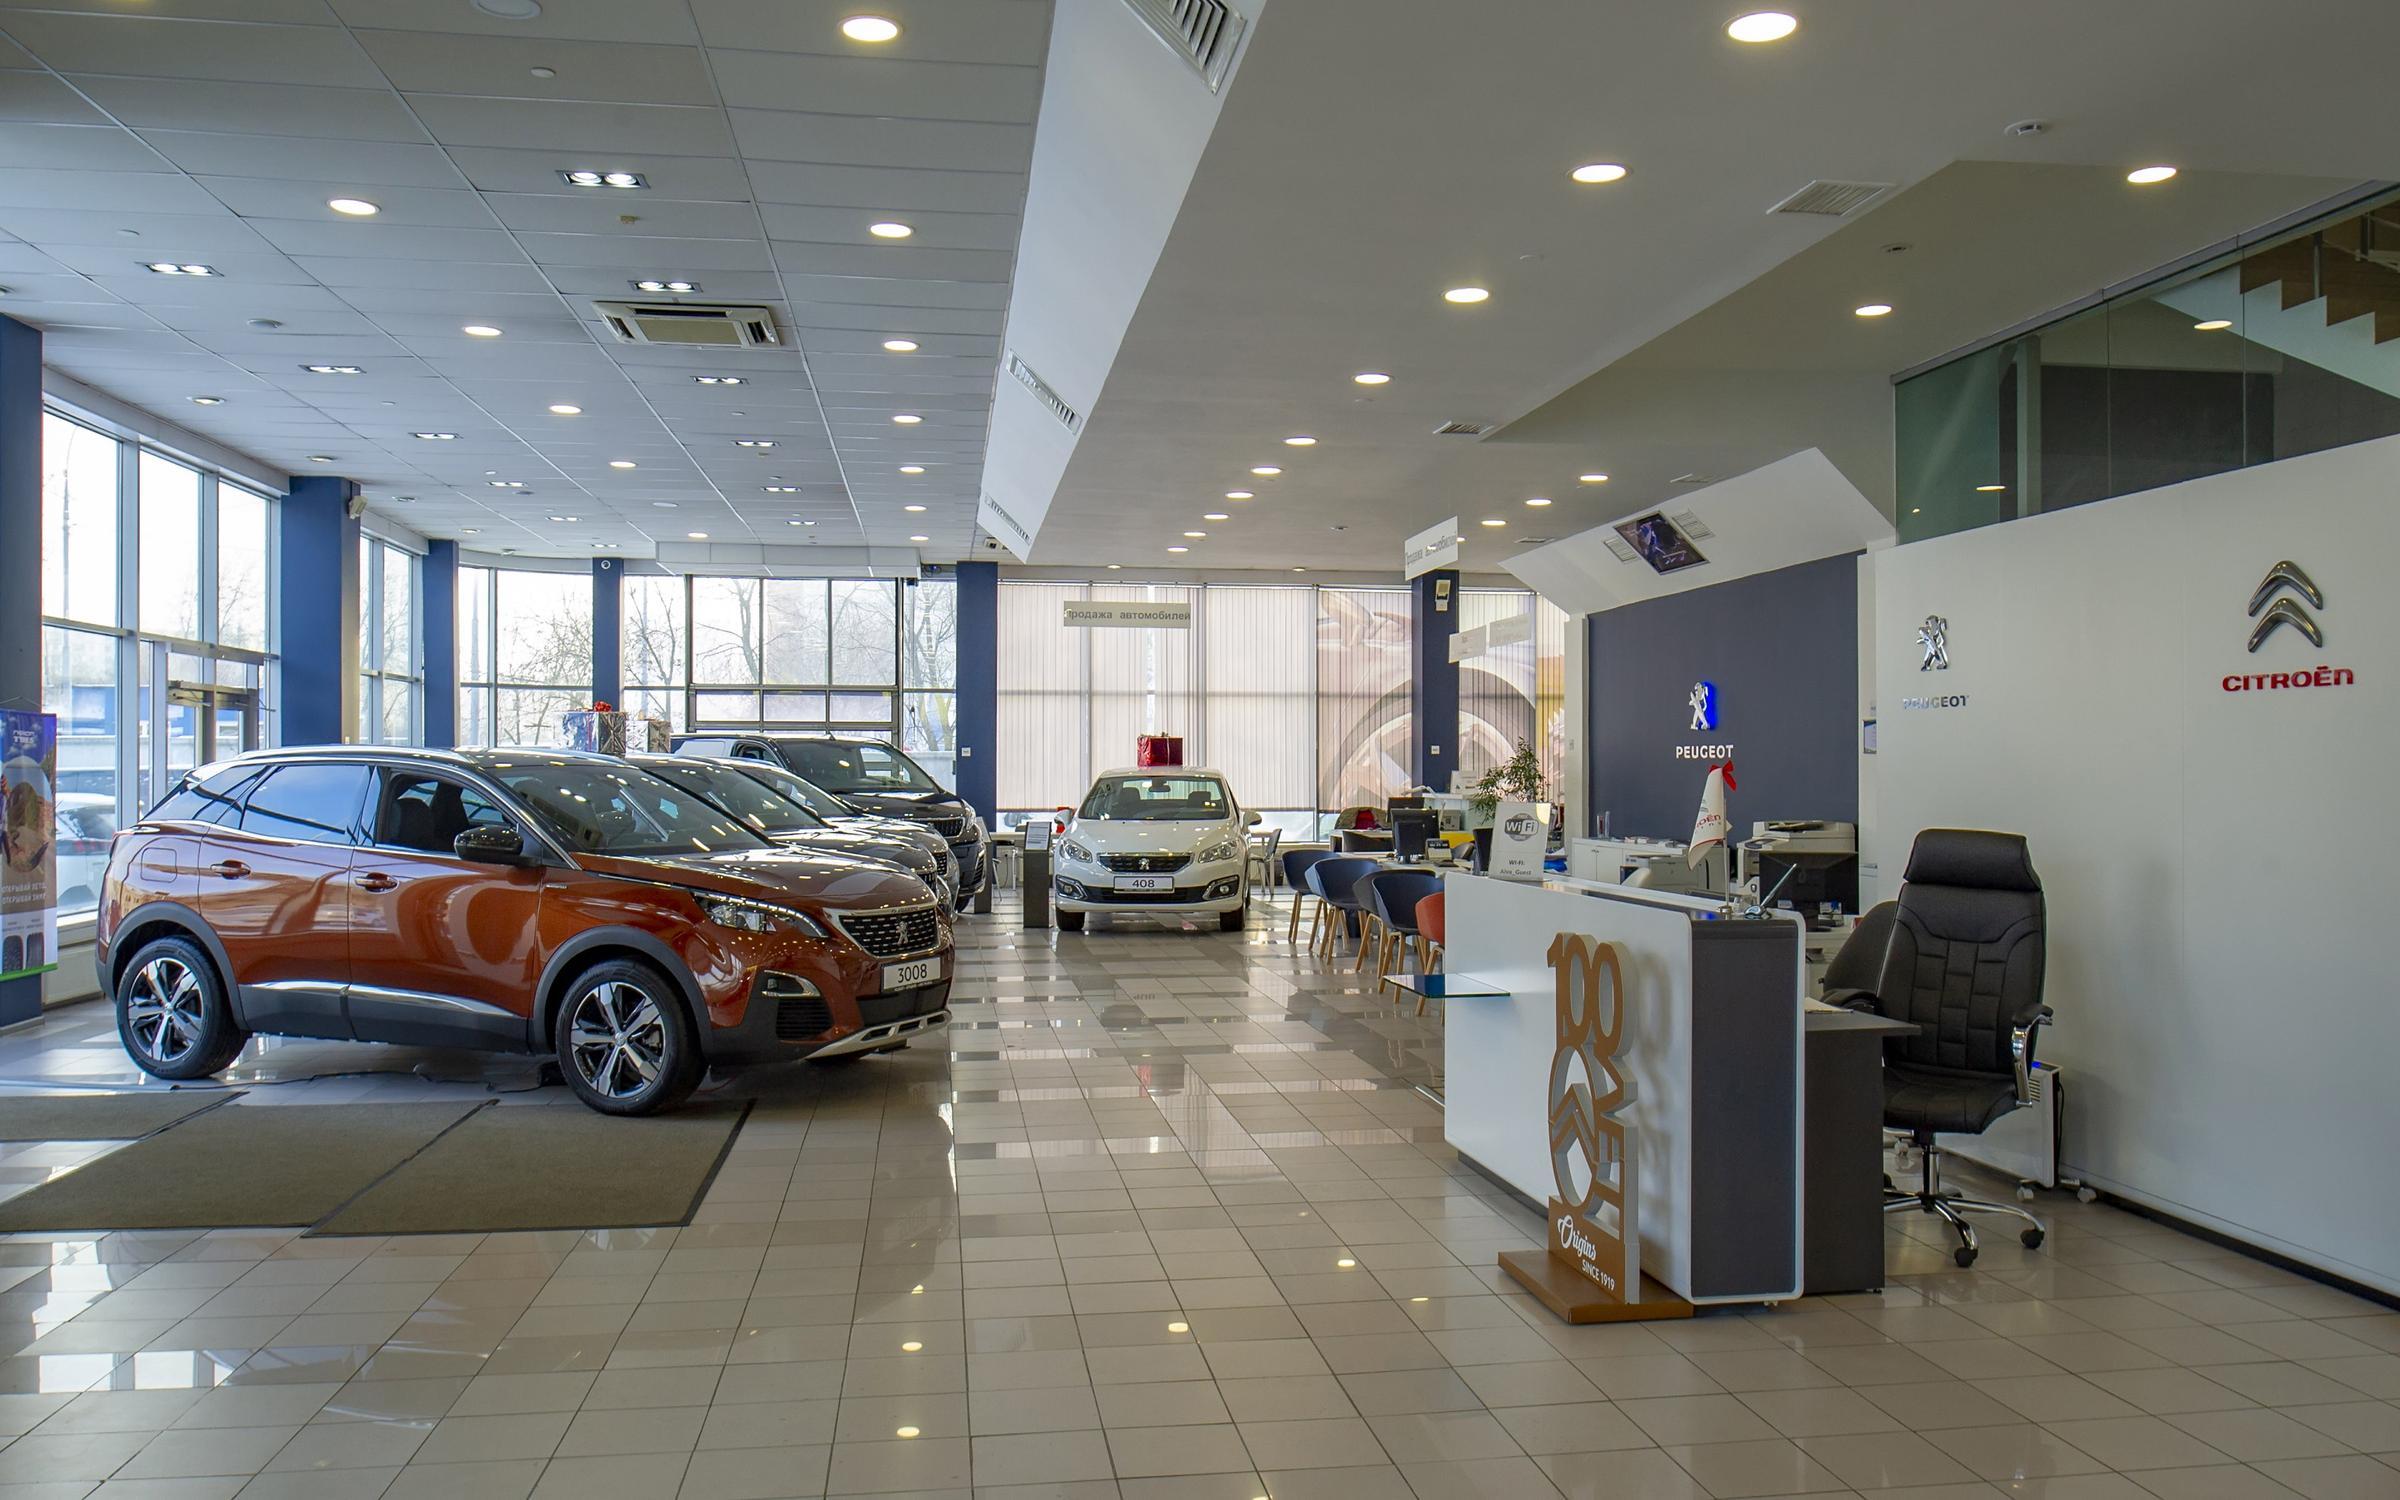 Автосалоны ситроен г москва кредит залог авто ростов